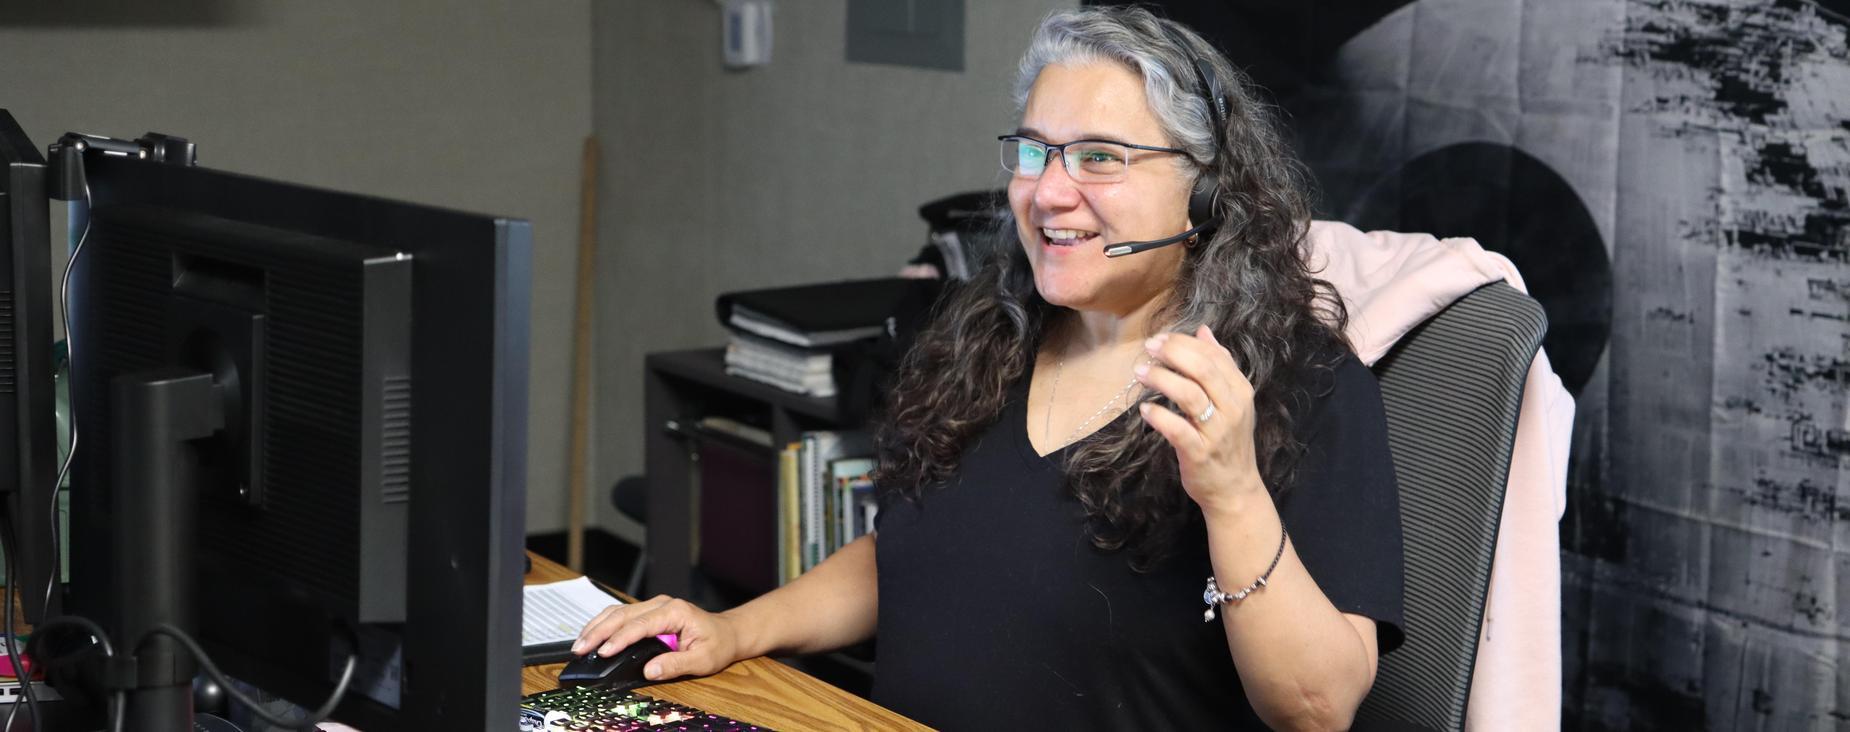 Teacher smiling while teaching online